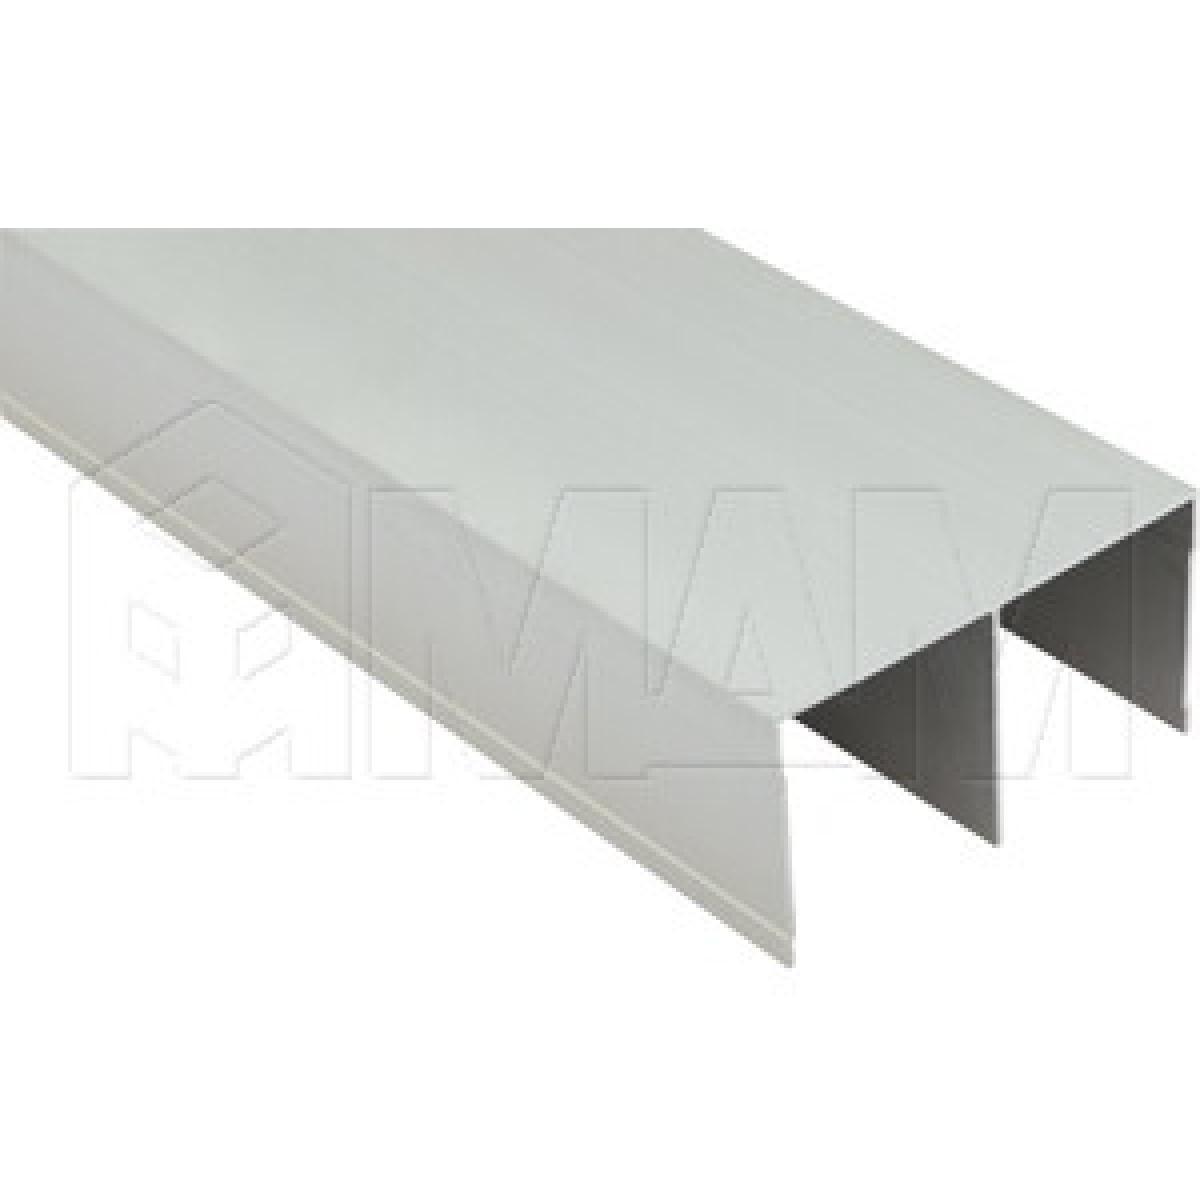 INTEGRO ECO Направляющая верхняя серебро, L-5400